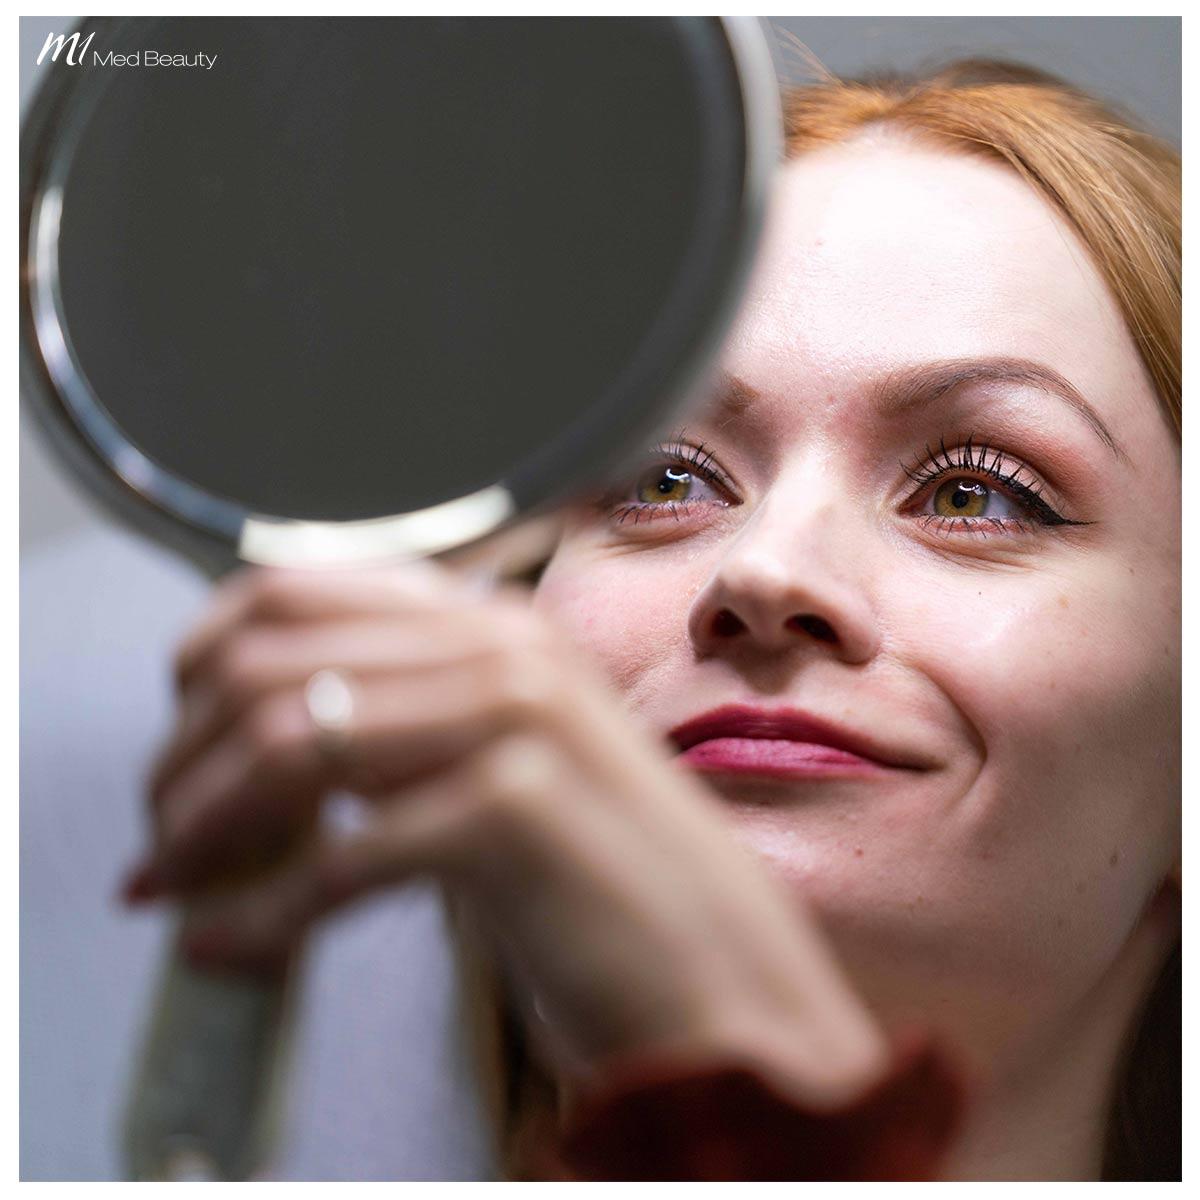 cheek filler treatment at M1 Med Beauty - after